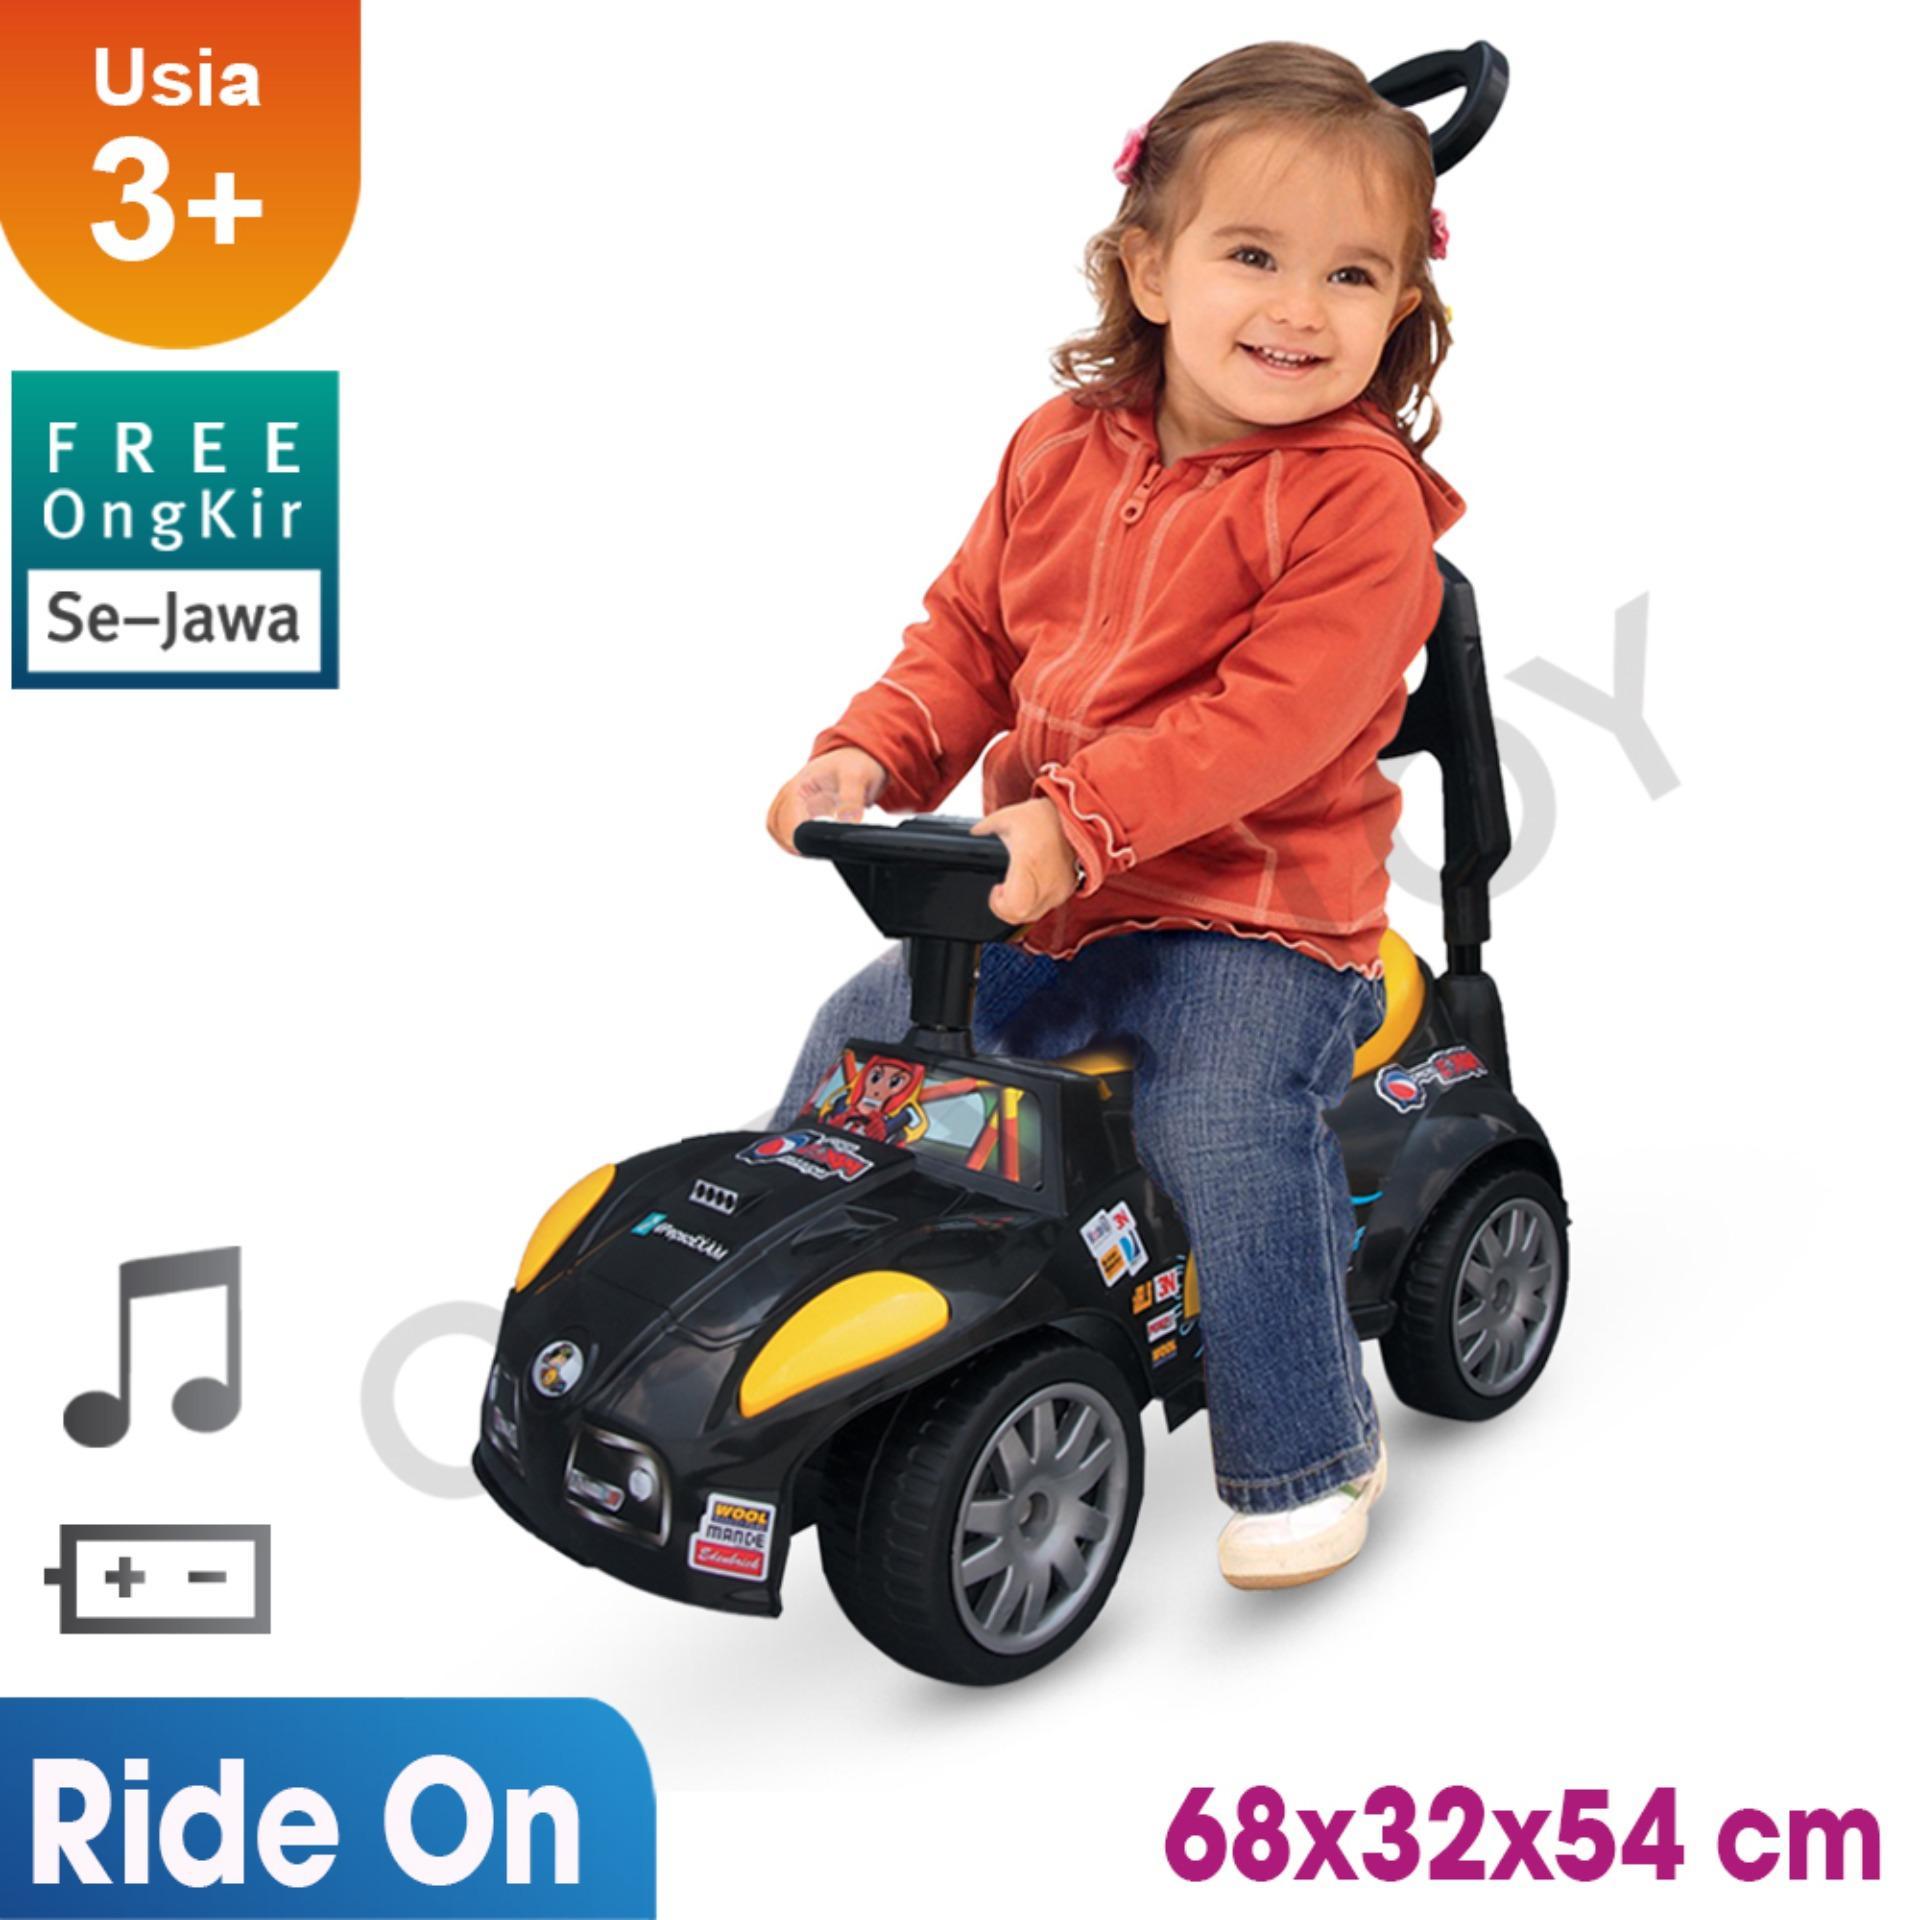 Spesifikasi Free Ongkir Se Jawa Ocean Toy Yotta Ride On Mobil Pembalap Mainan Anak Black Dan Harganya